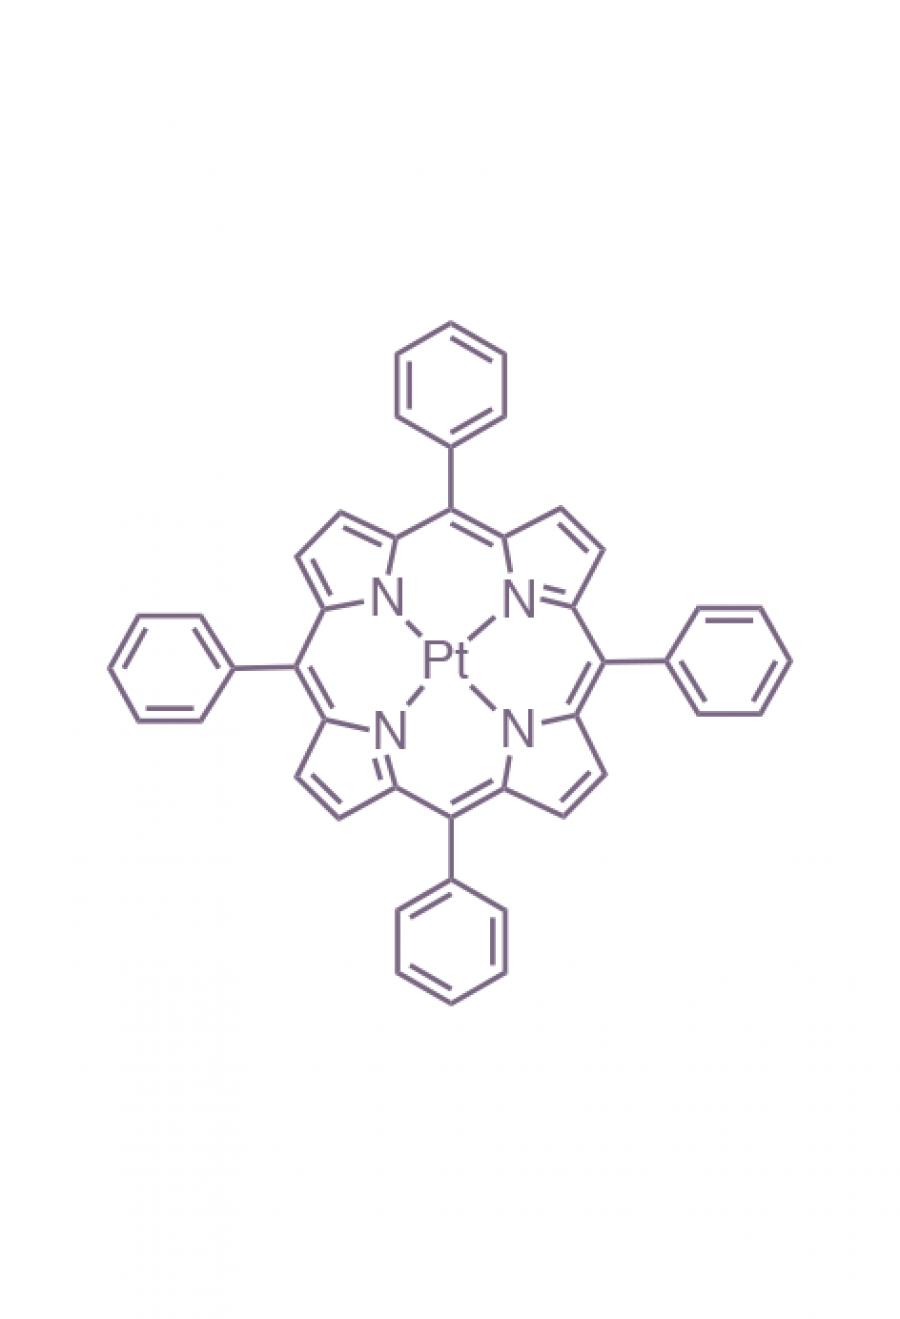 platinum(II) 5,10,15,20-(tetraphenyl)porphyrin